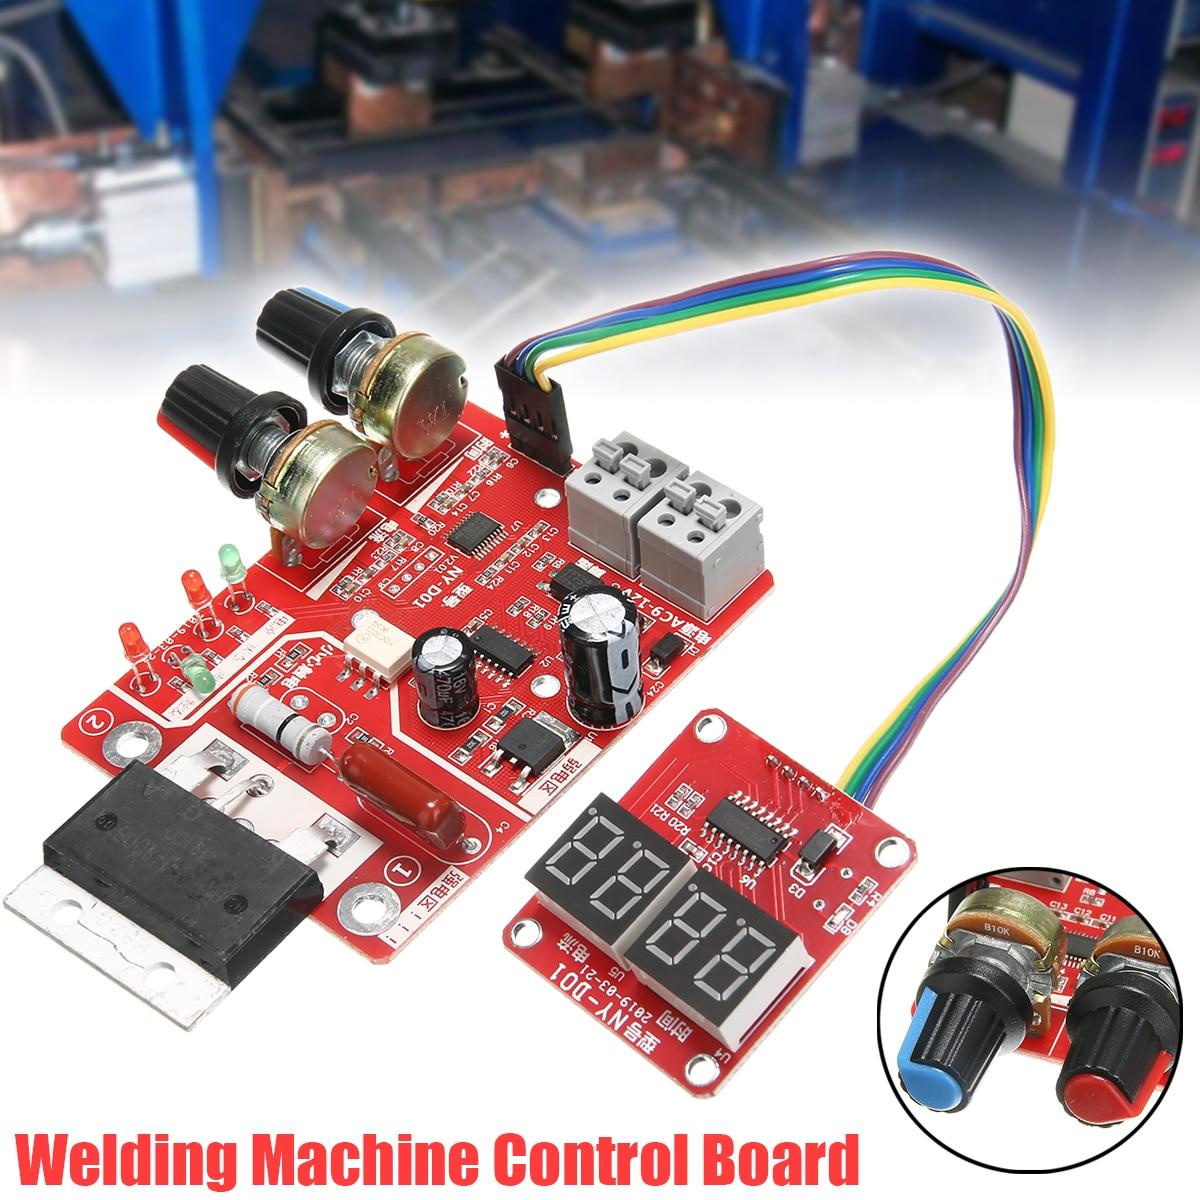 100A Spot Welding Machine Control Board Welder Transformer Controller Board Timing Current Time Current Digital Display